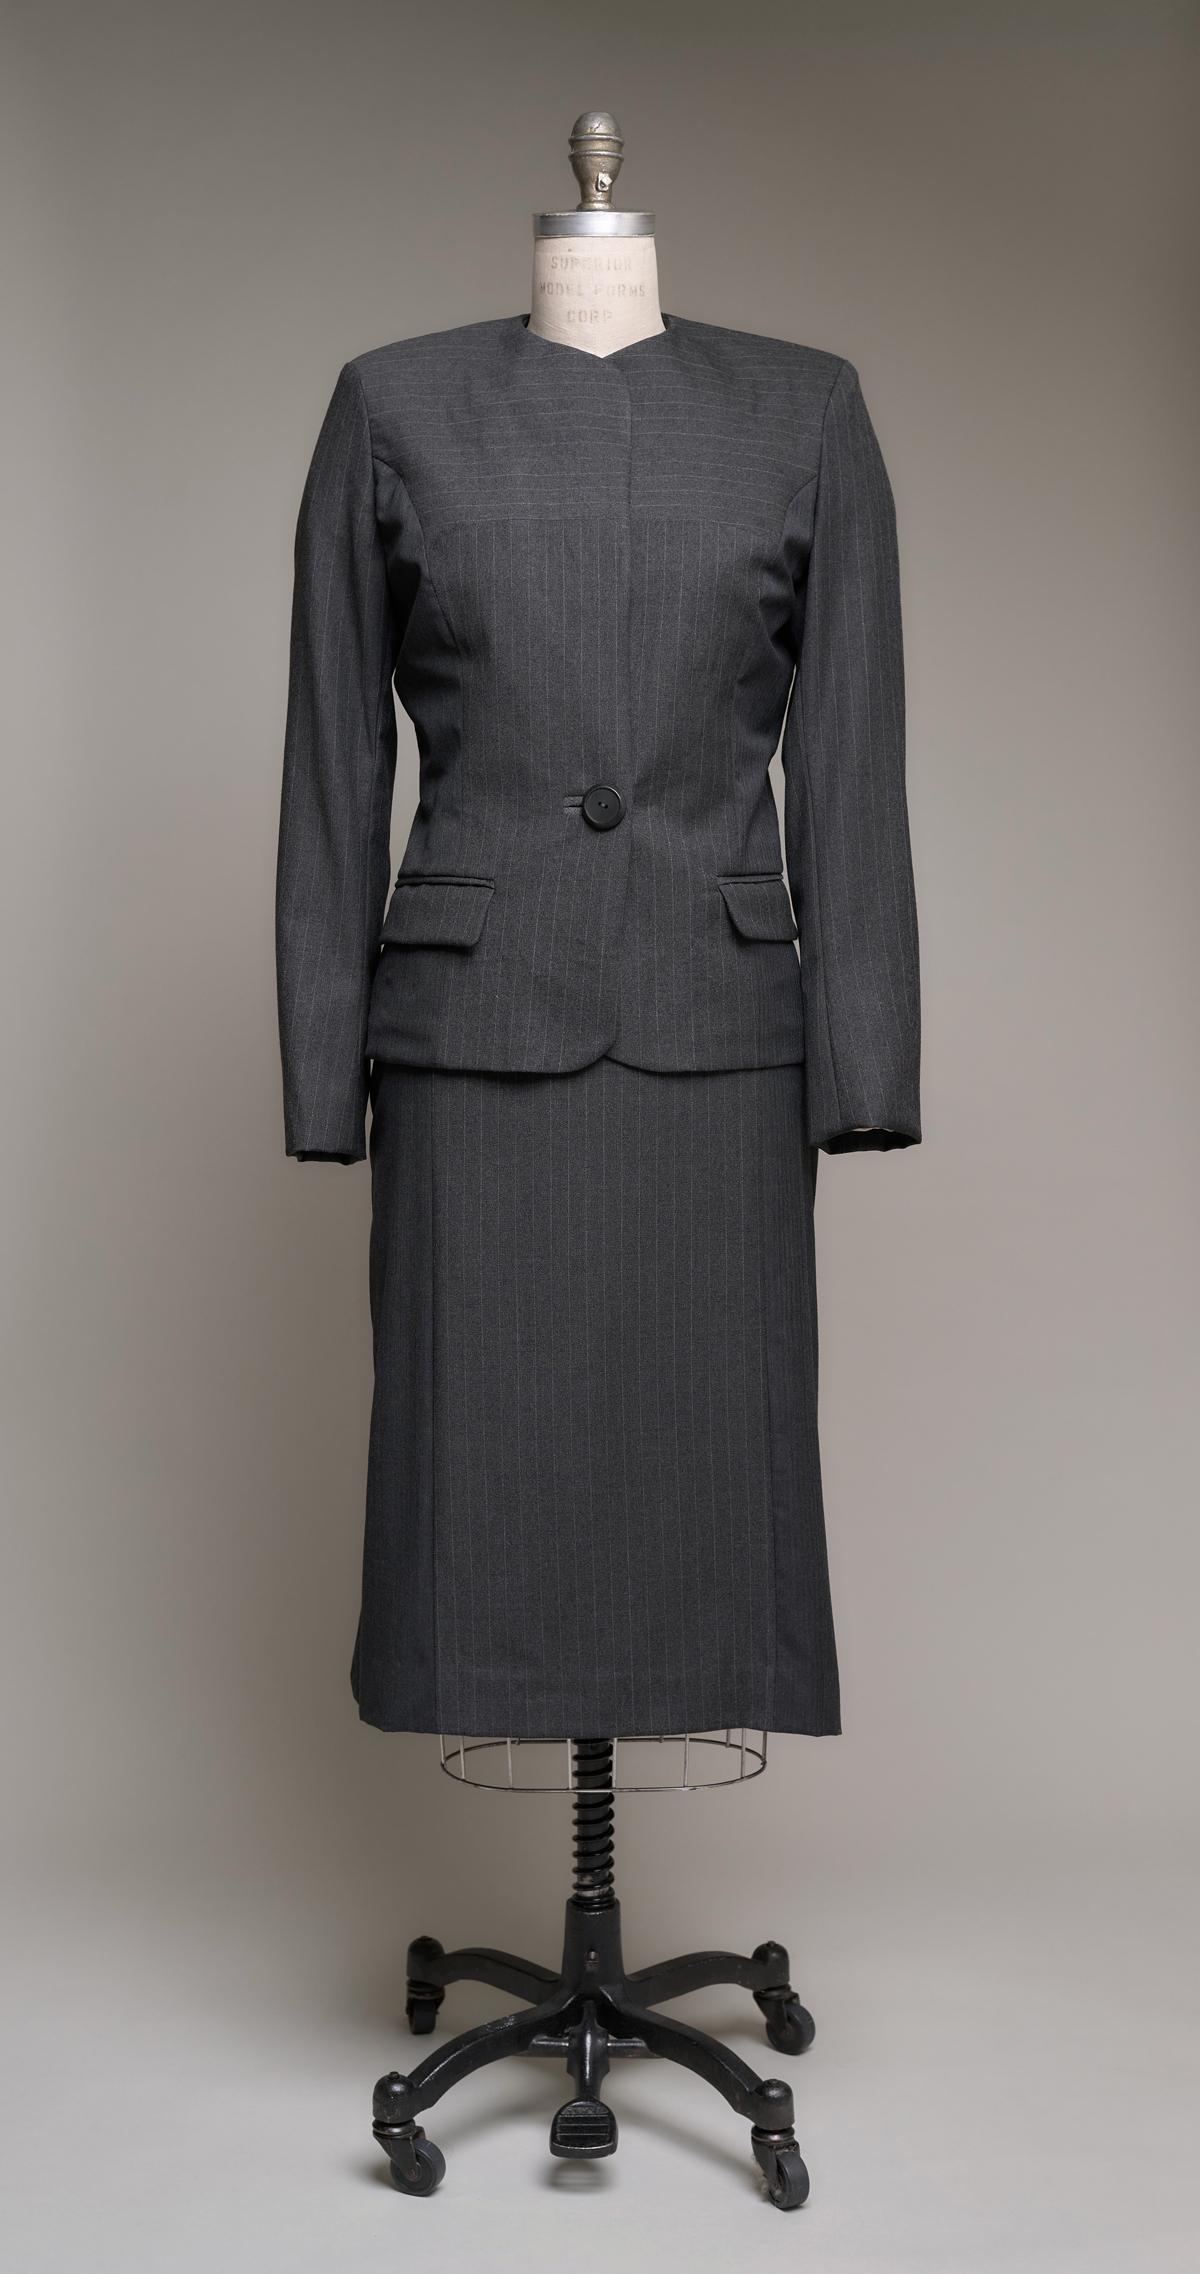 Women's dark gray pinstripe suit on dress form